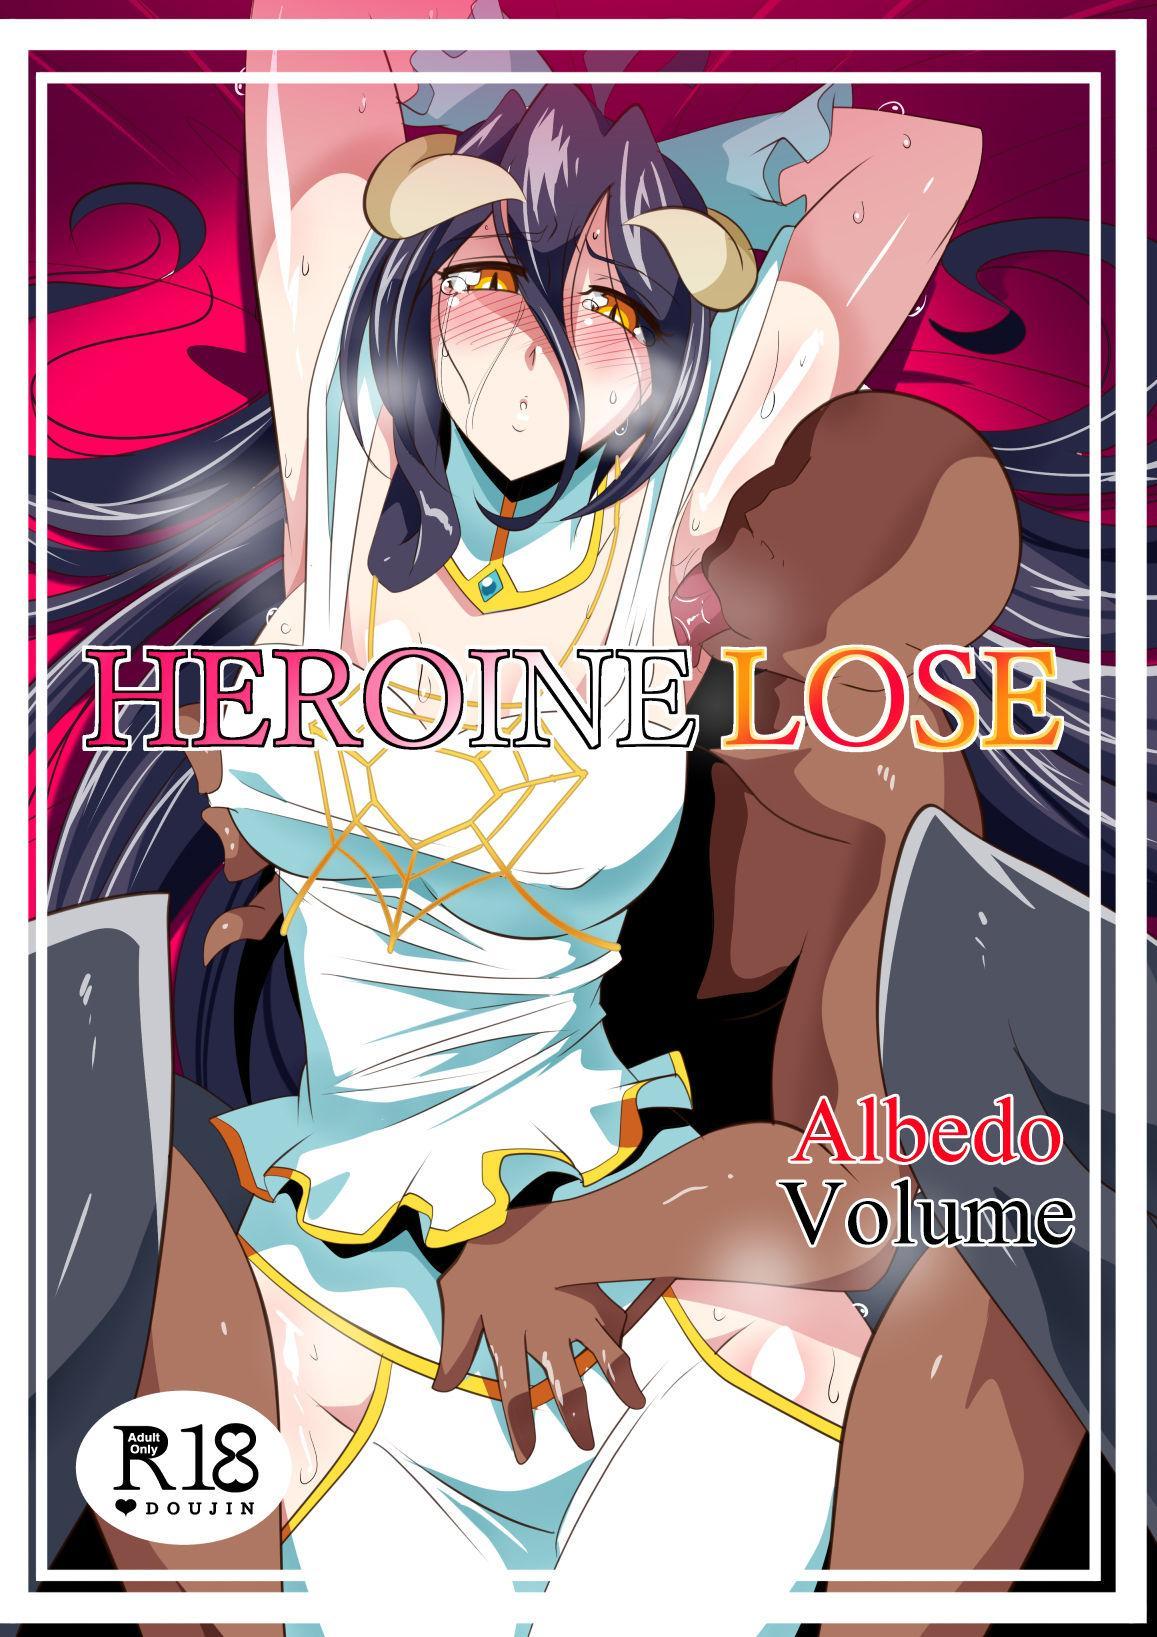 HEROINE LOSE Albedo Hen   HEROINE LOSE Albedo Volume 1